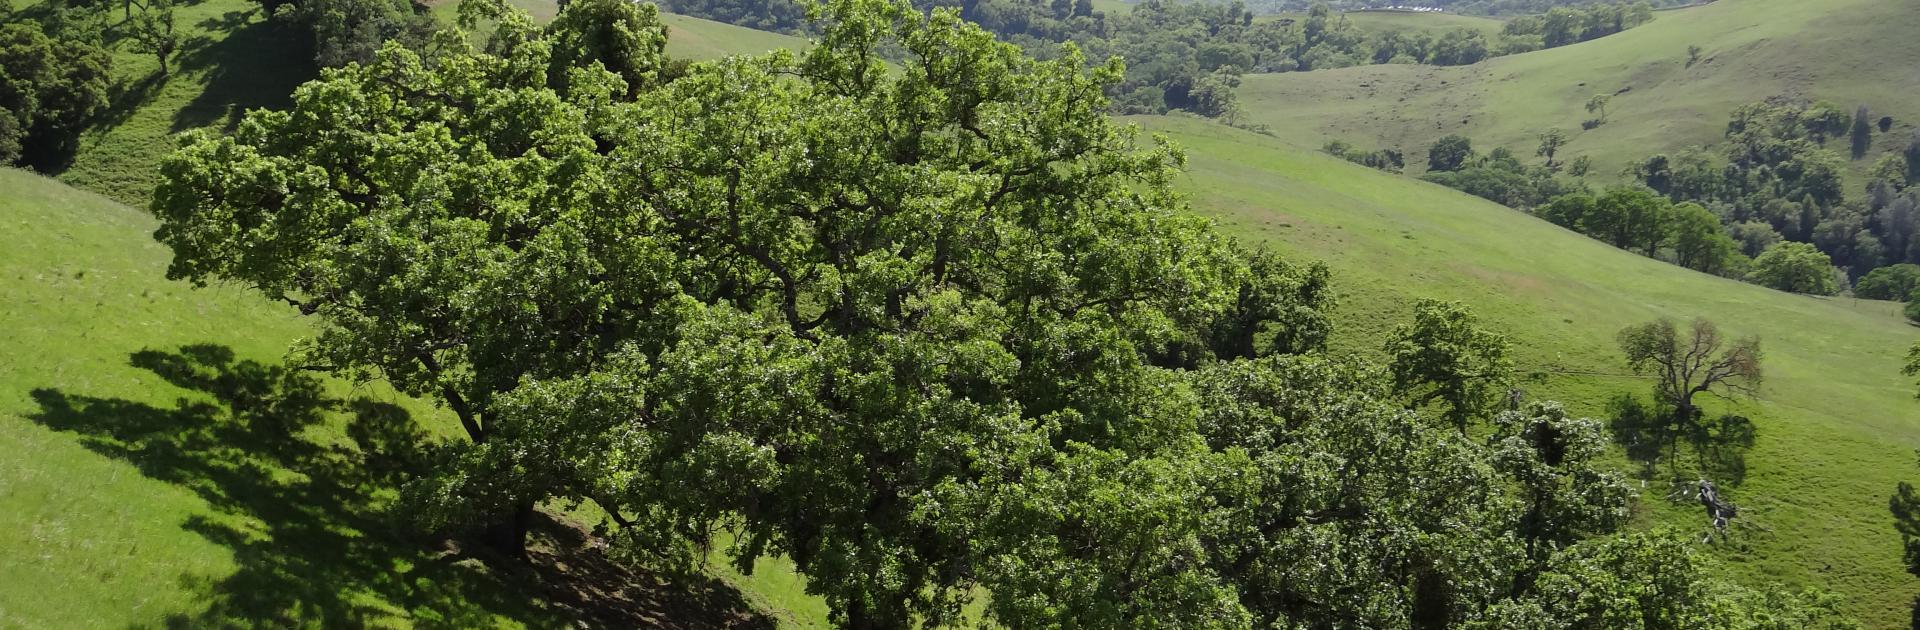 Photo of Valley Oak Trees